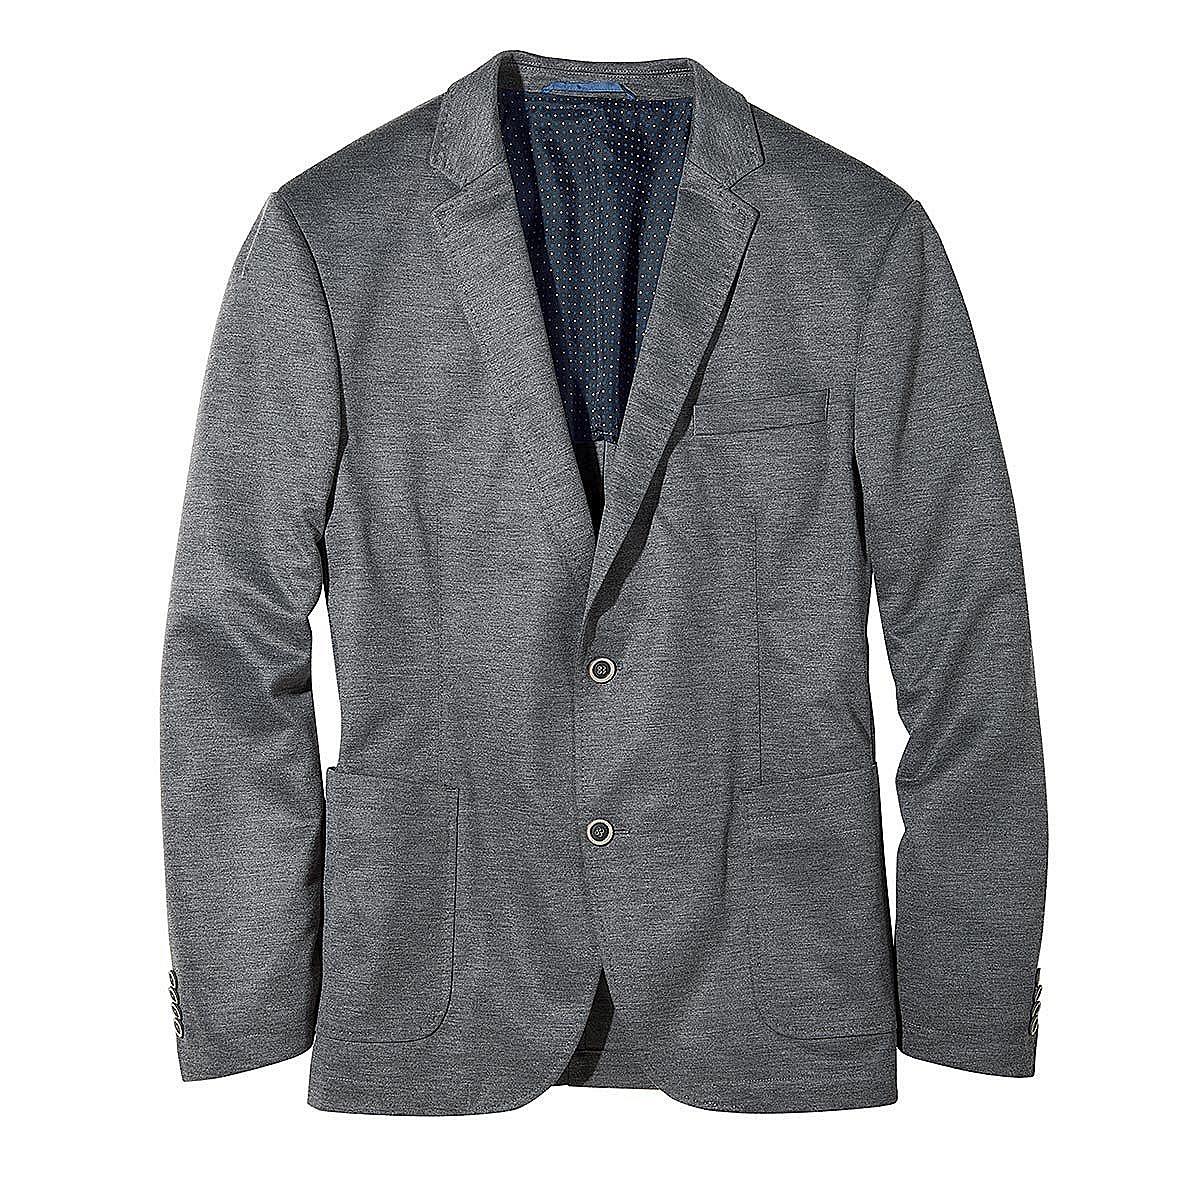 leichtes modernes jersey sakko farbe grau gr enspezialist m nnermode. Black Bedroom Furniture Sets. Home Design Ideas